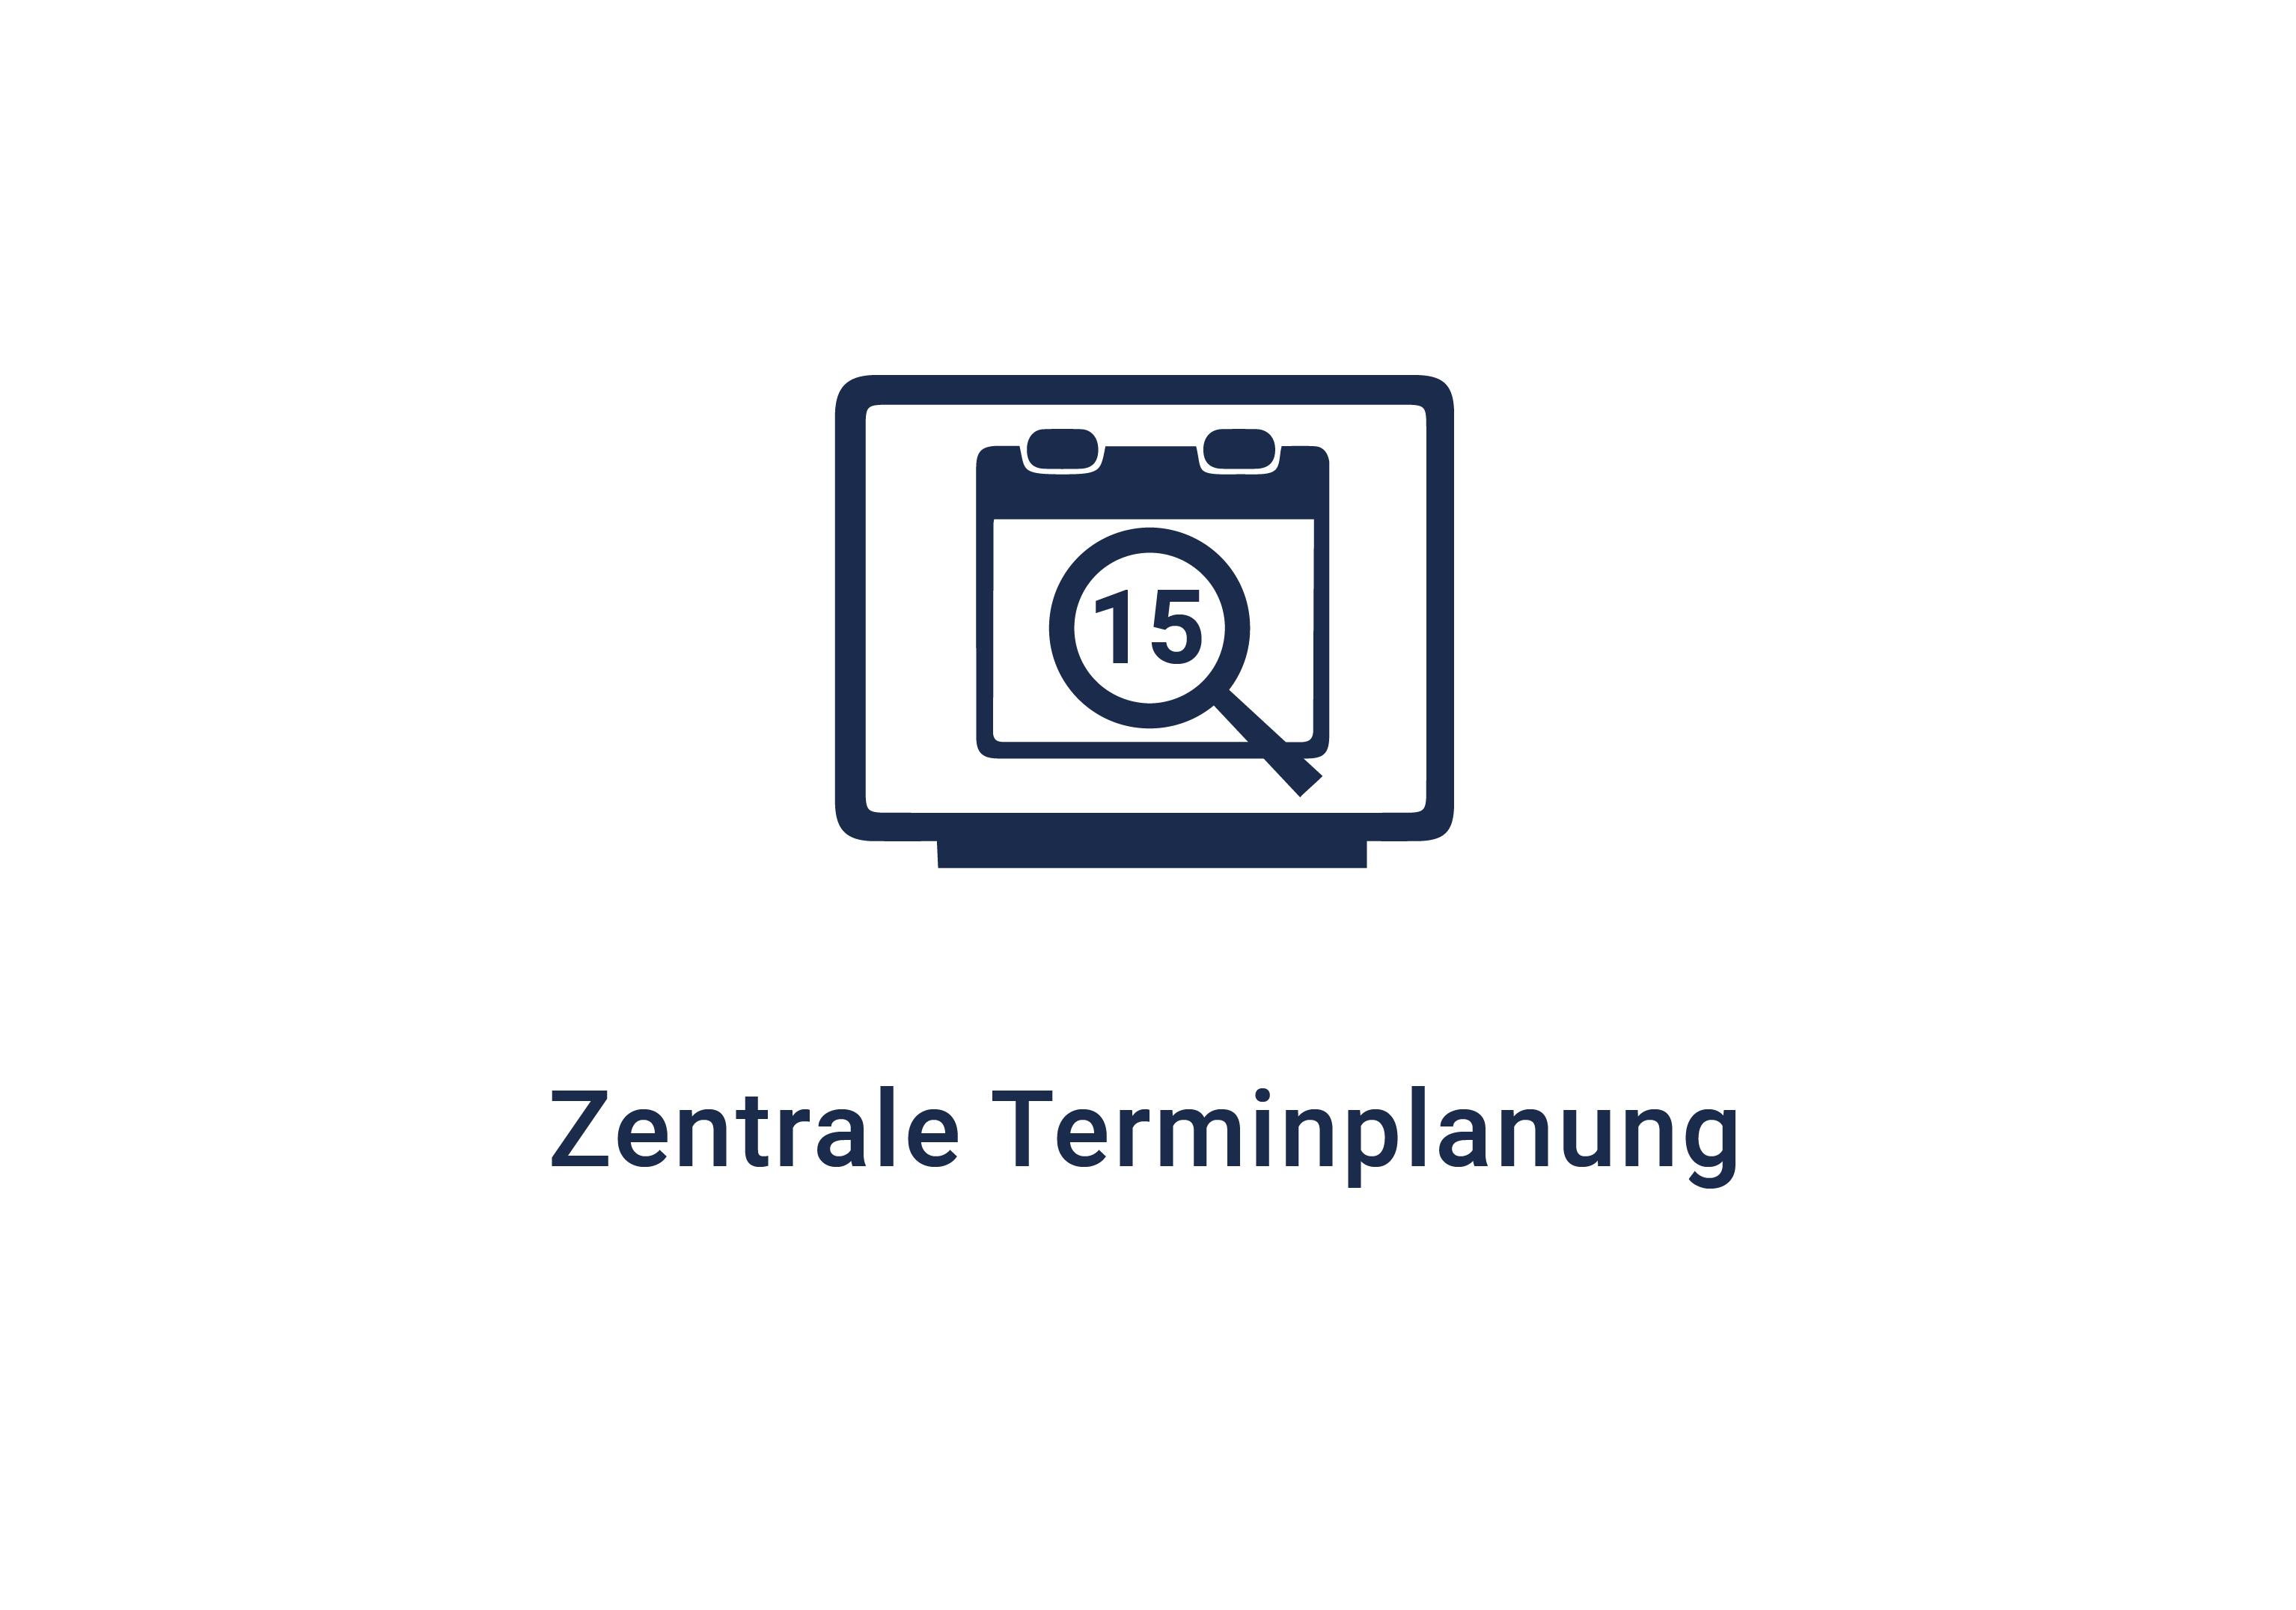 zentrale_terminplanung_01